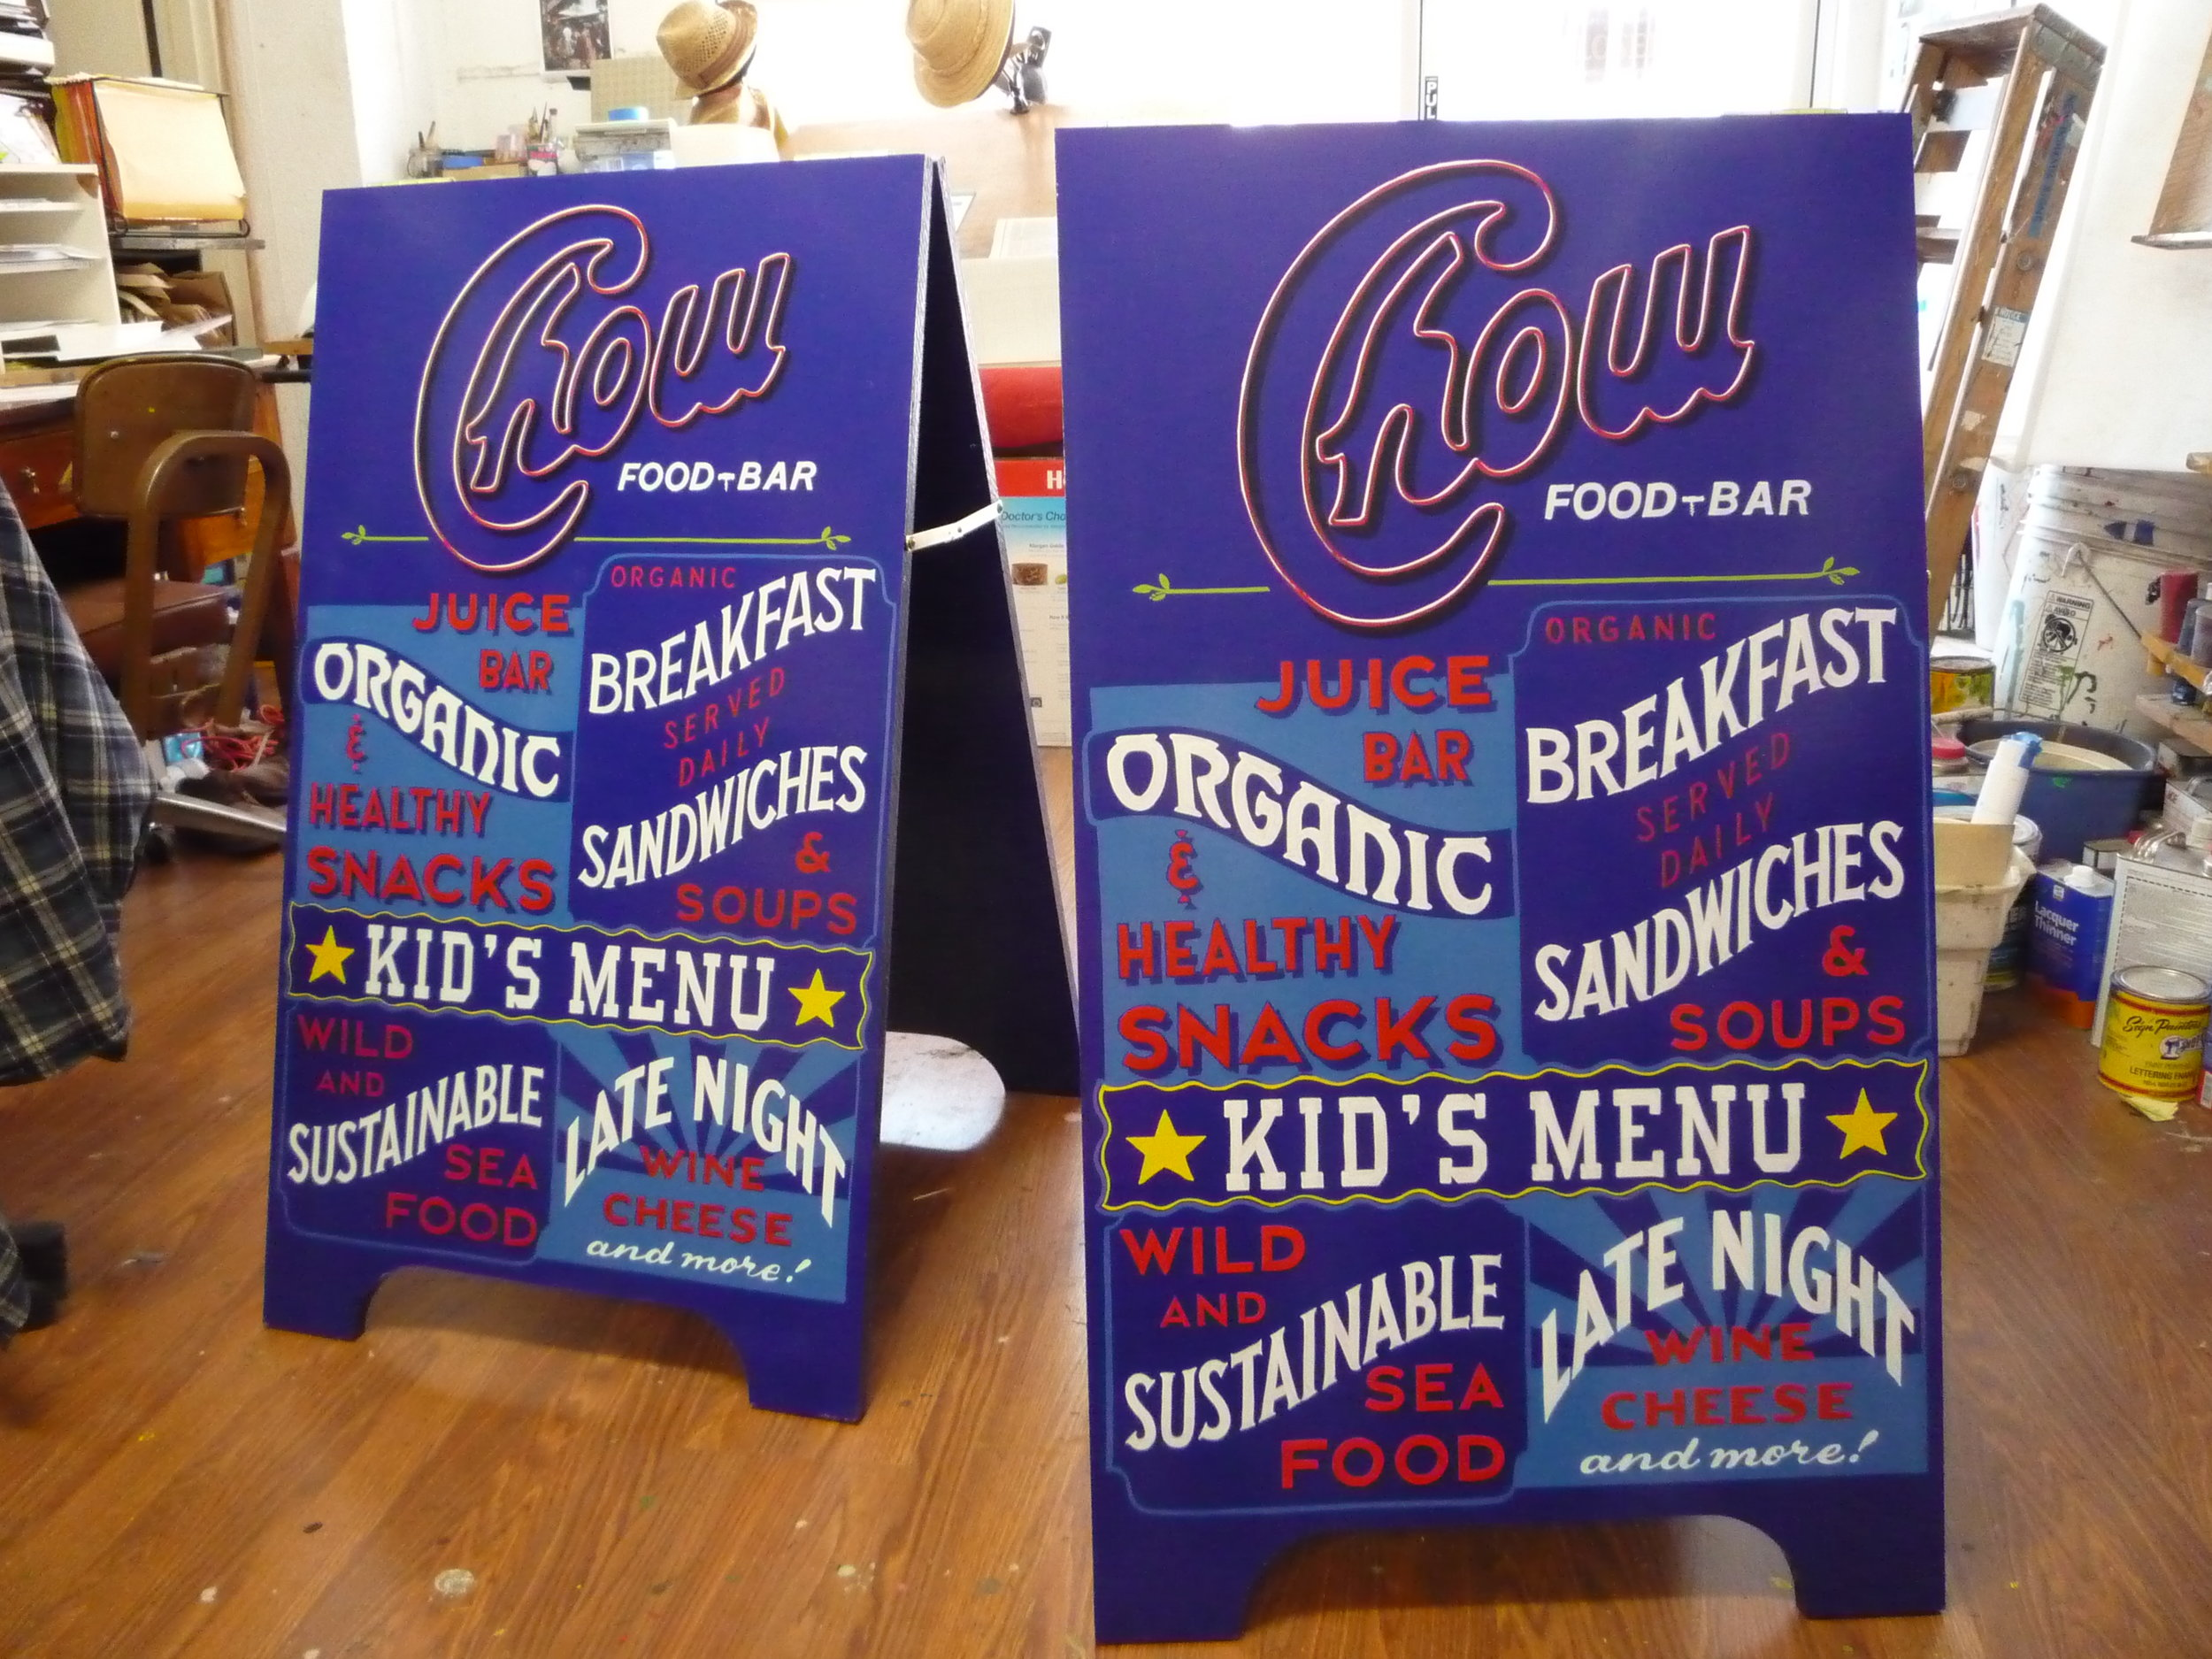 ORIG-new-sandwich-boards-for-chow-danville_3617800051_o.jpg